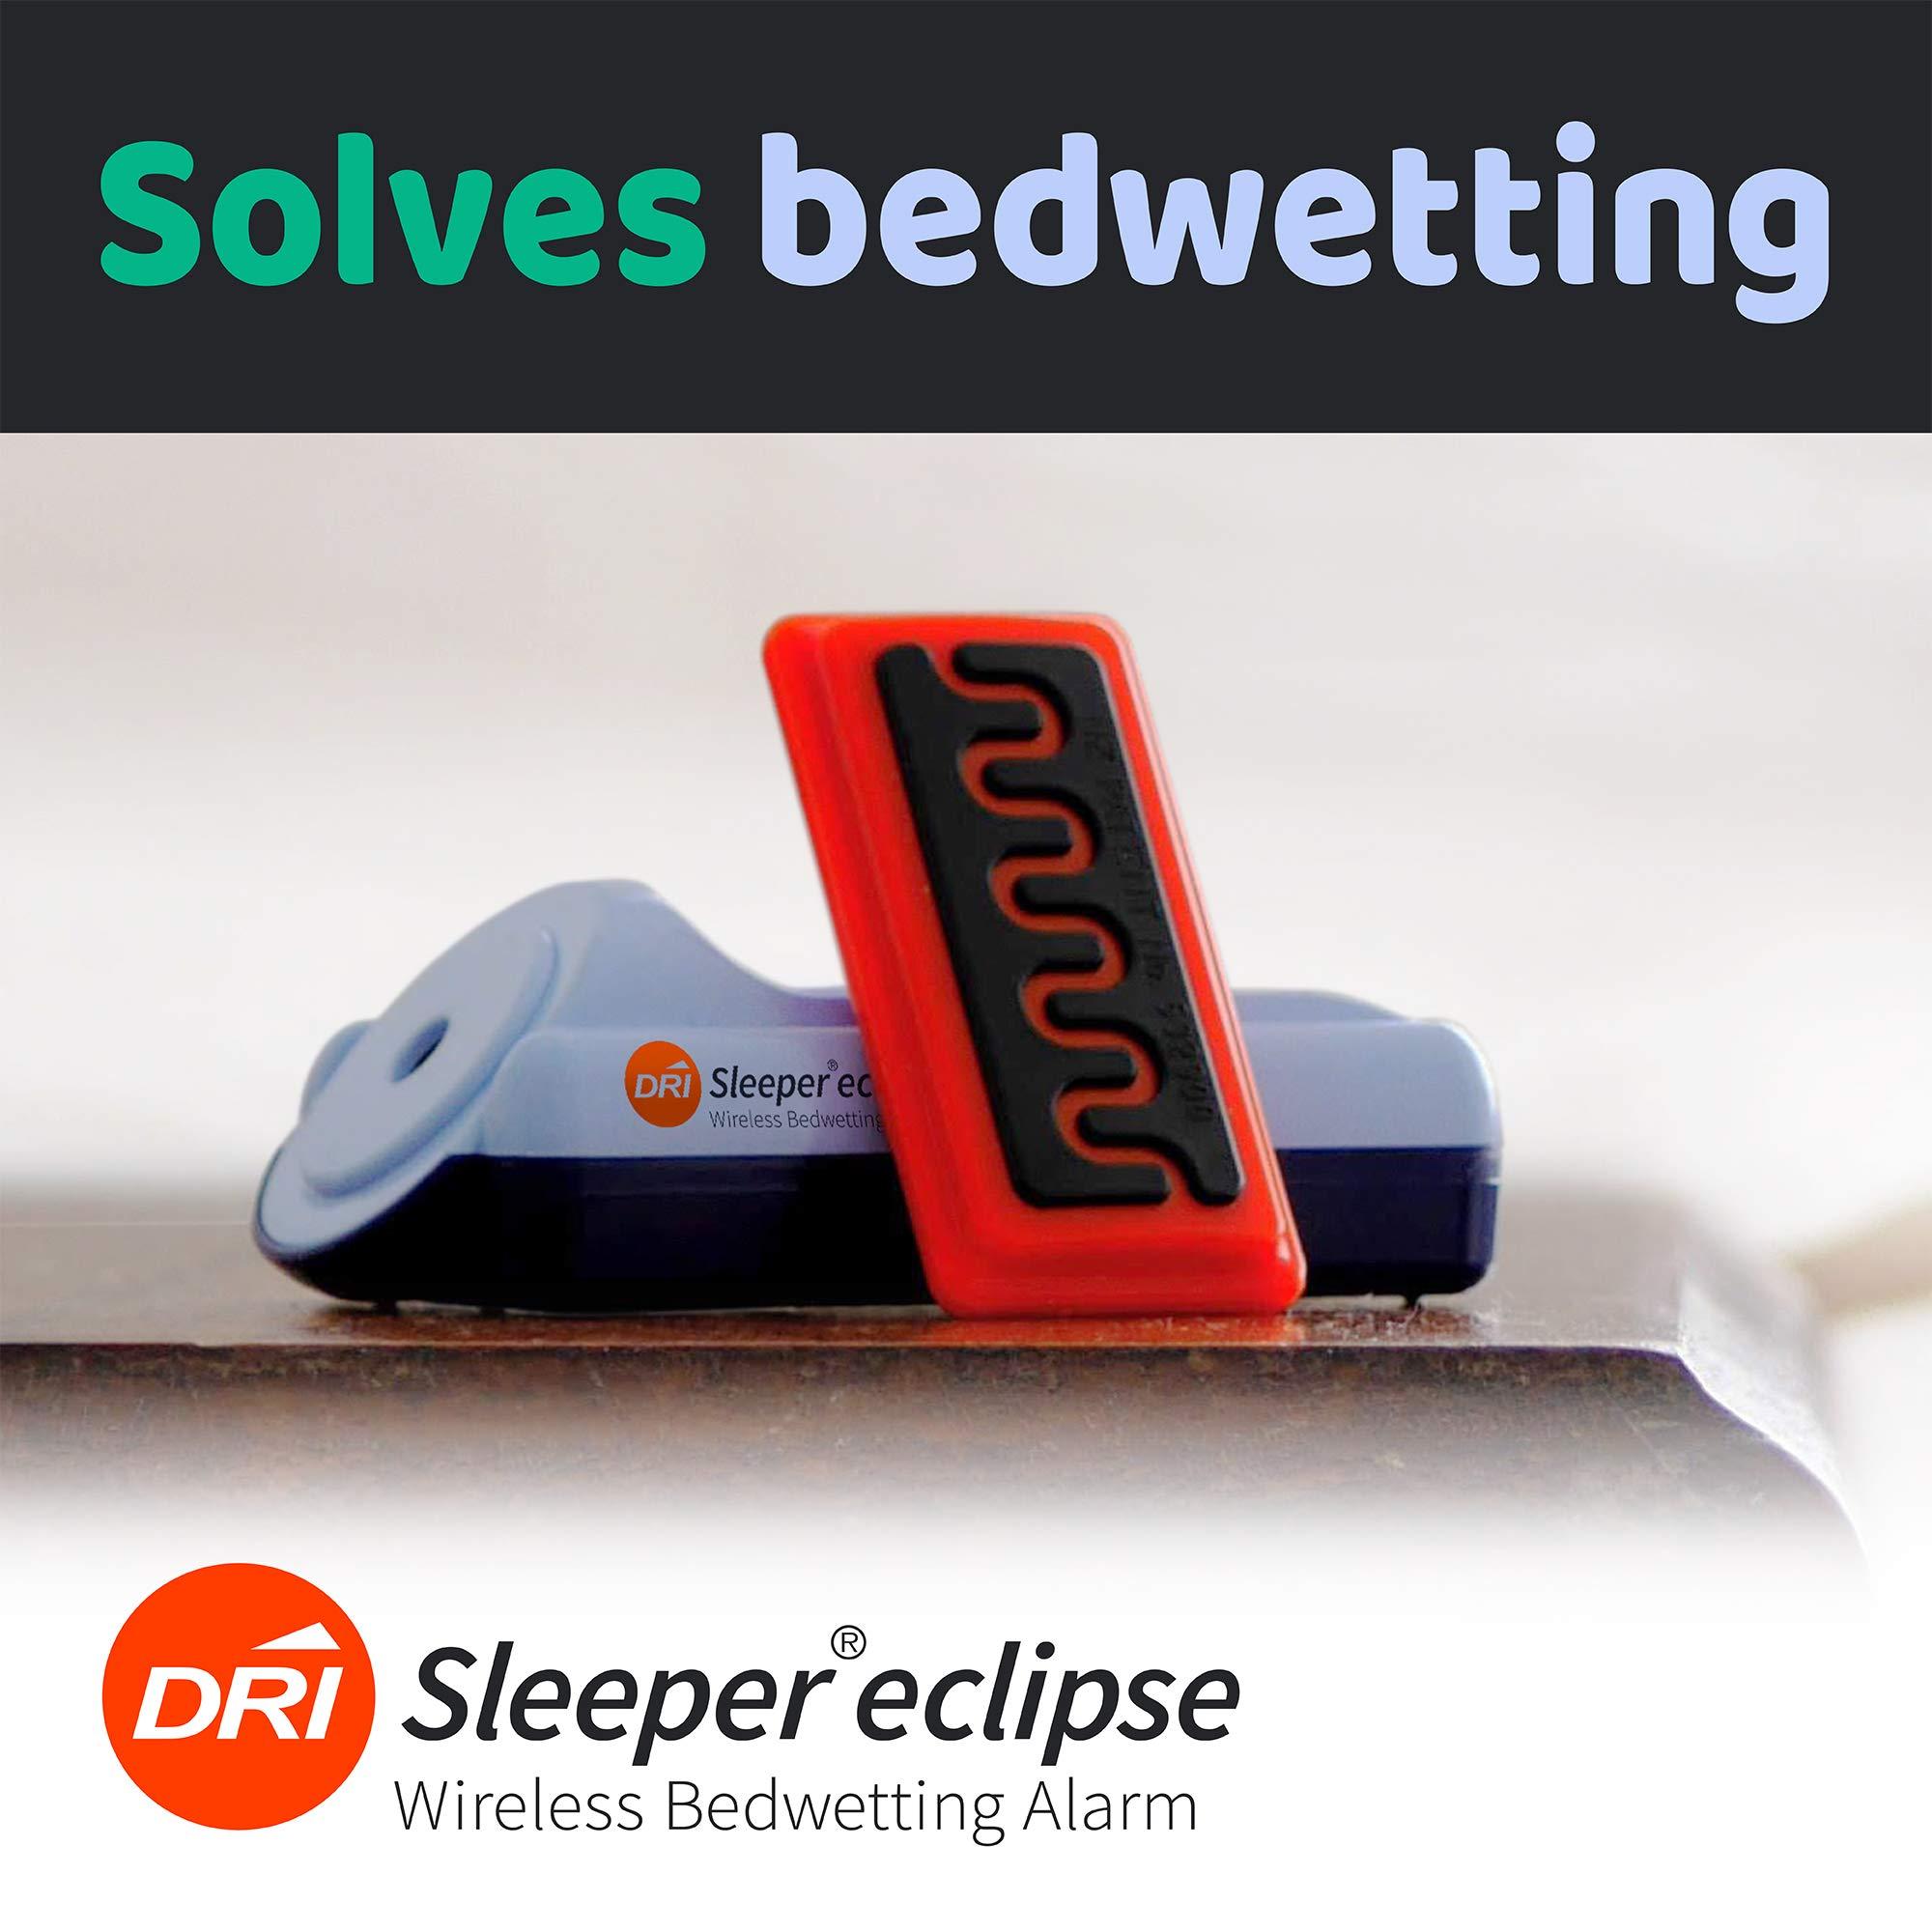 DRI Sleeper Eclipse Wireless Bedwetting Alarm by Dri Sleeper